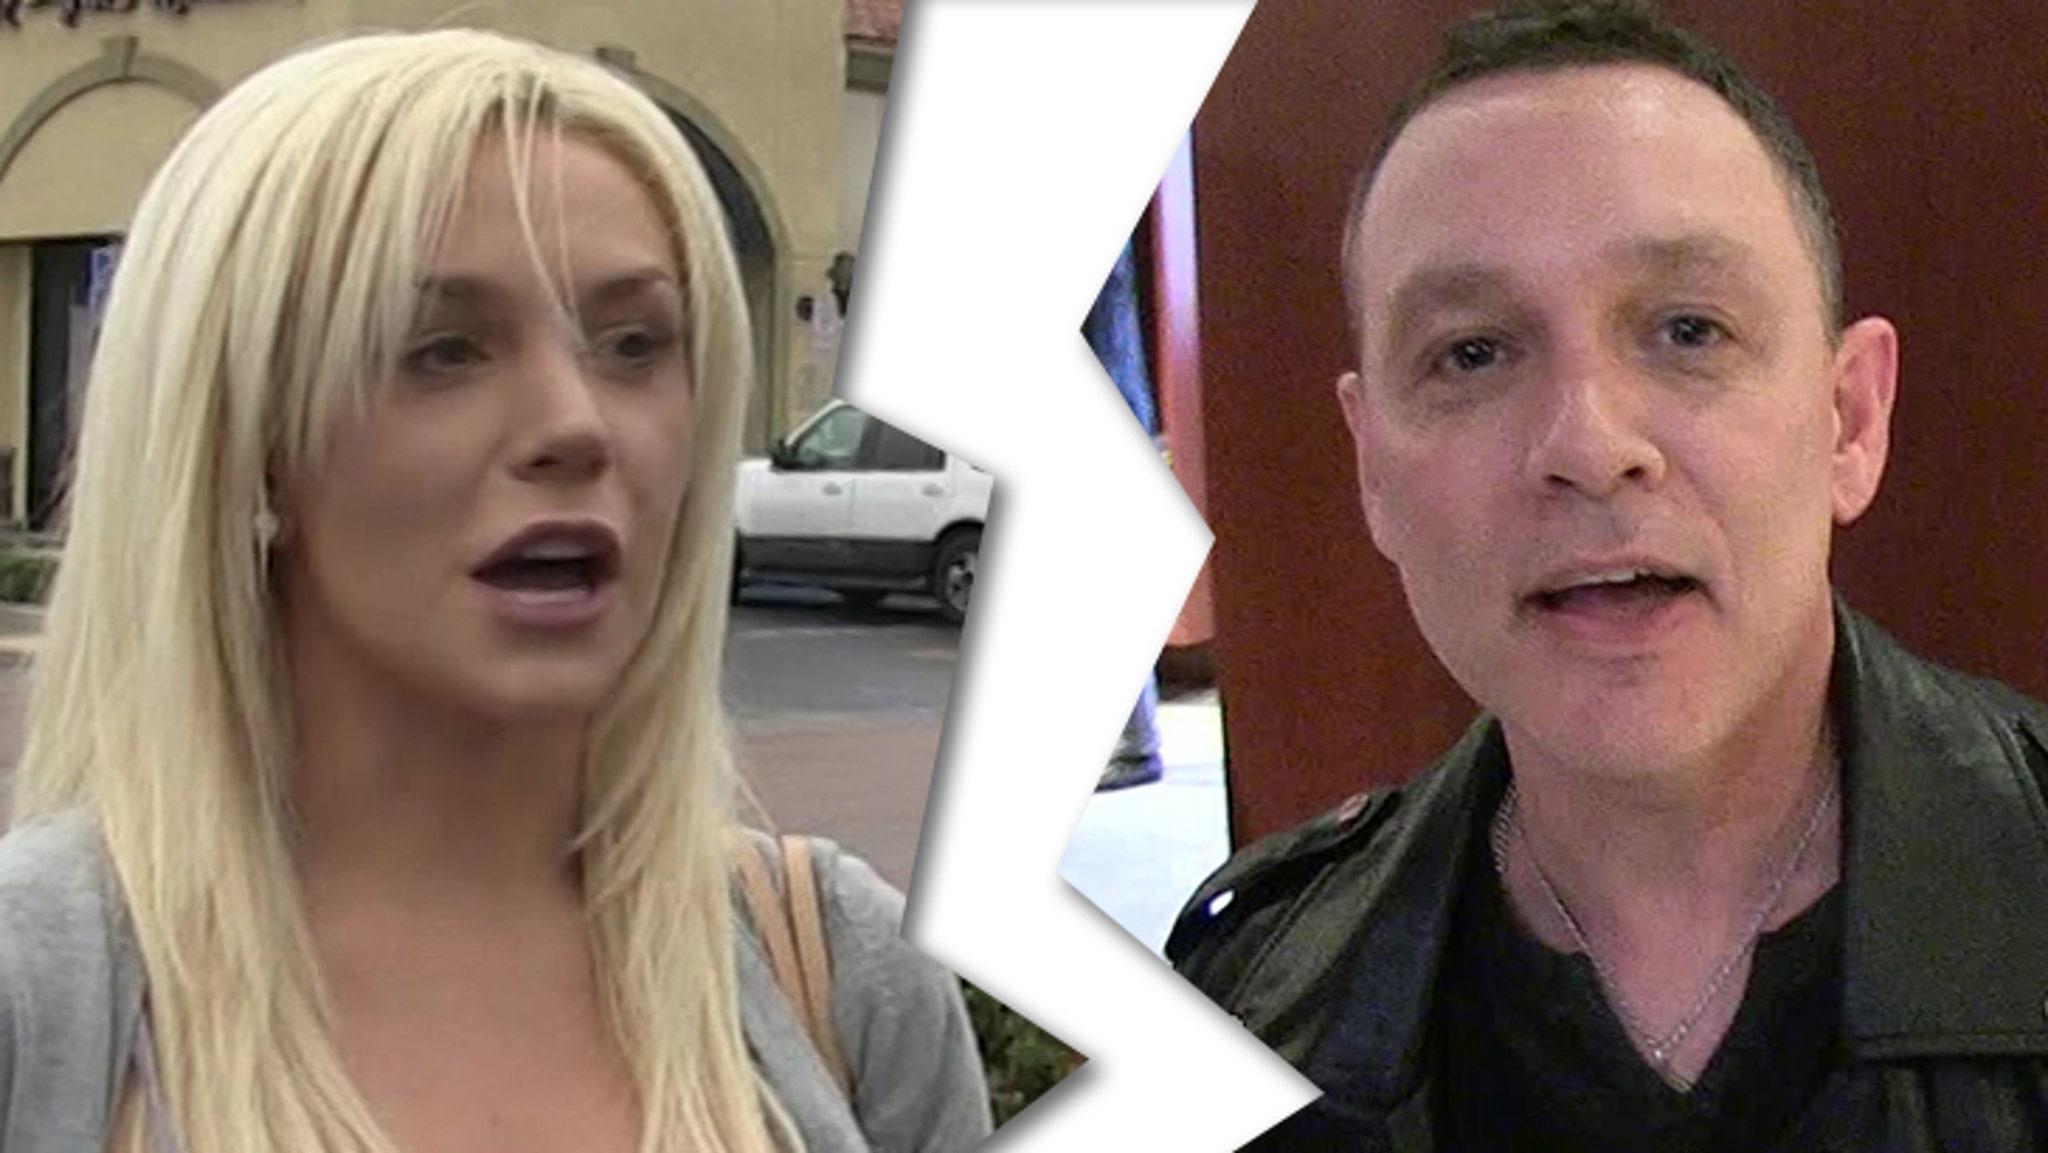 Courtney Stodden & Doug Hutchison Finalize Divorce, He Gets the Dog